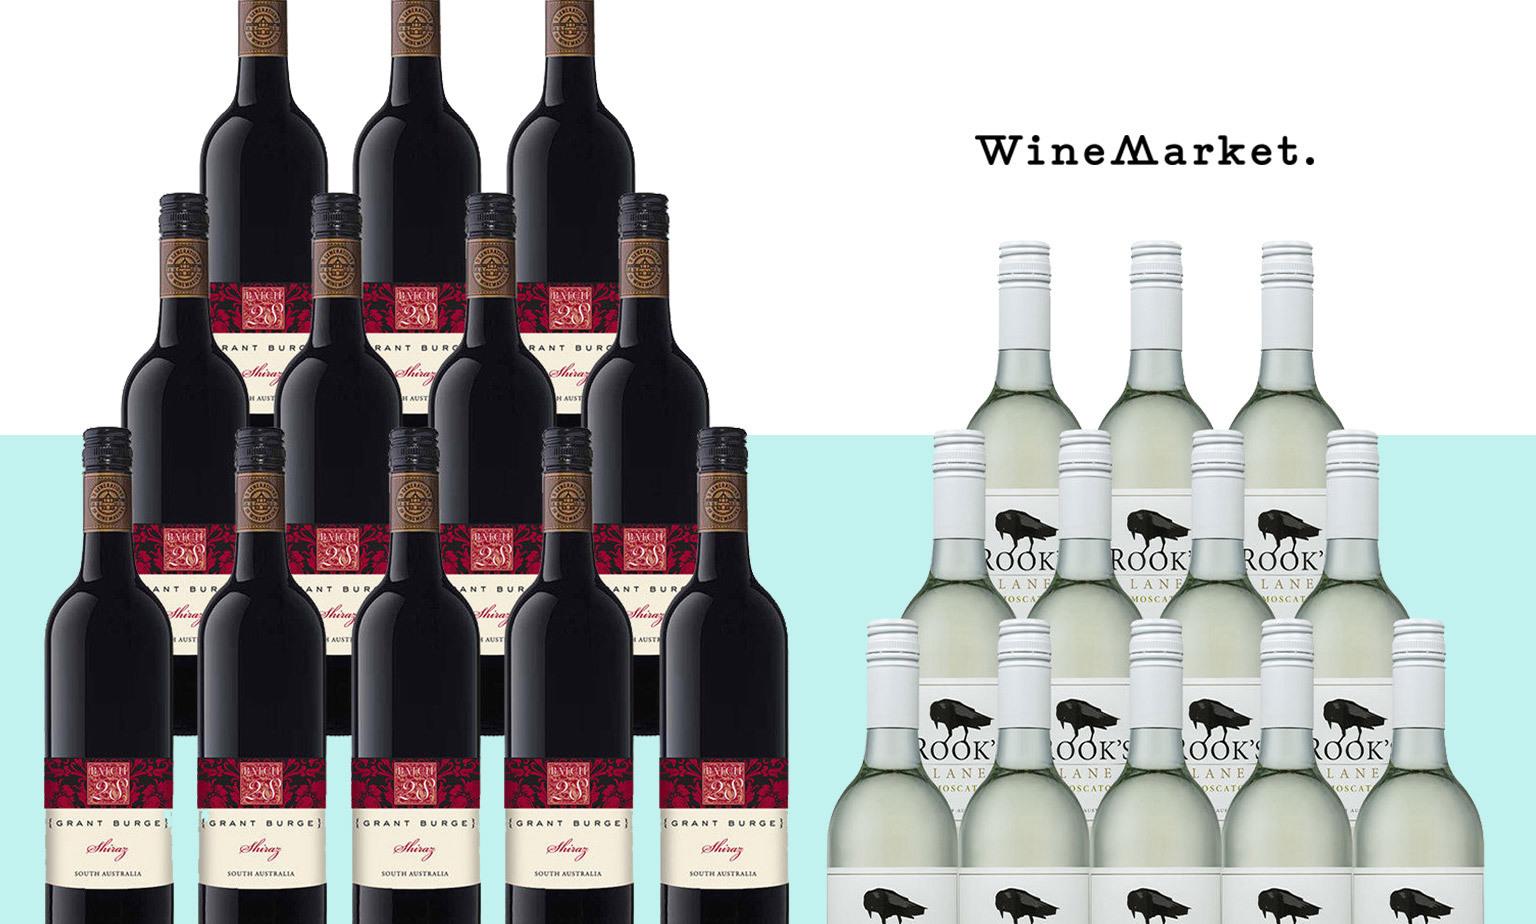 20% off* WineMarket